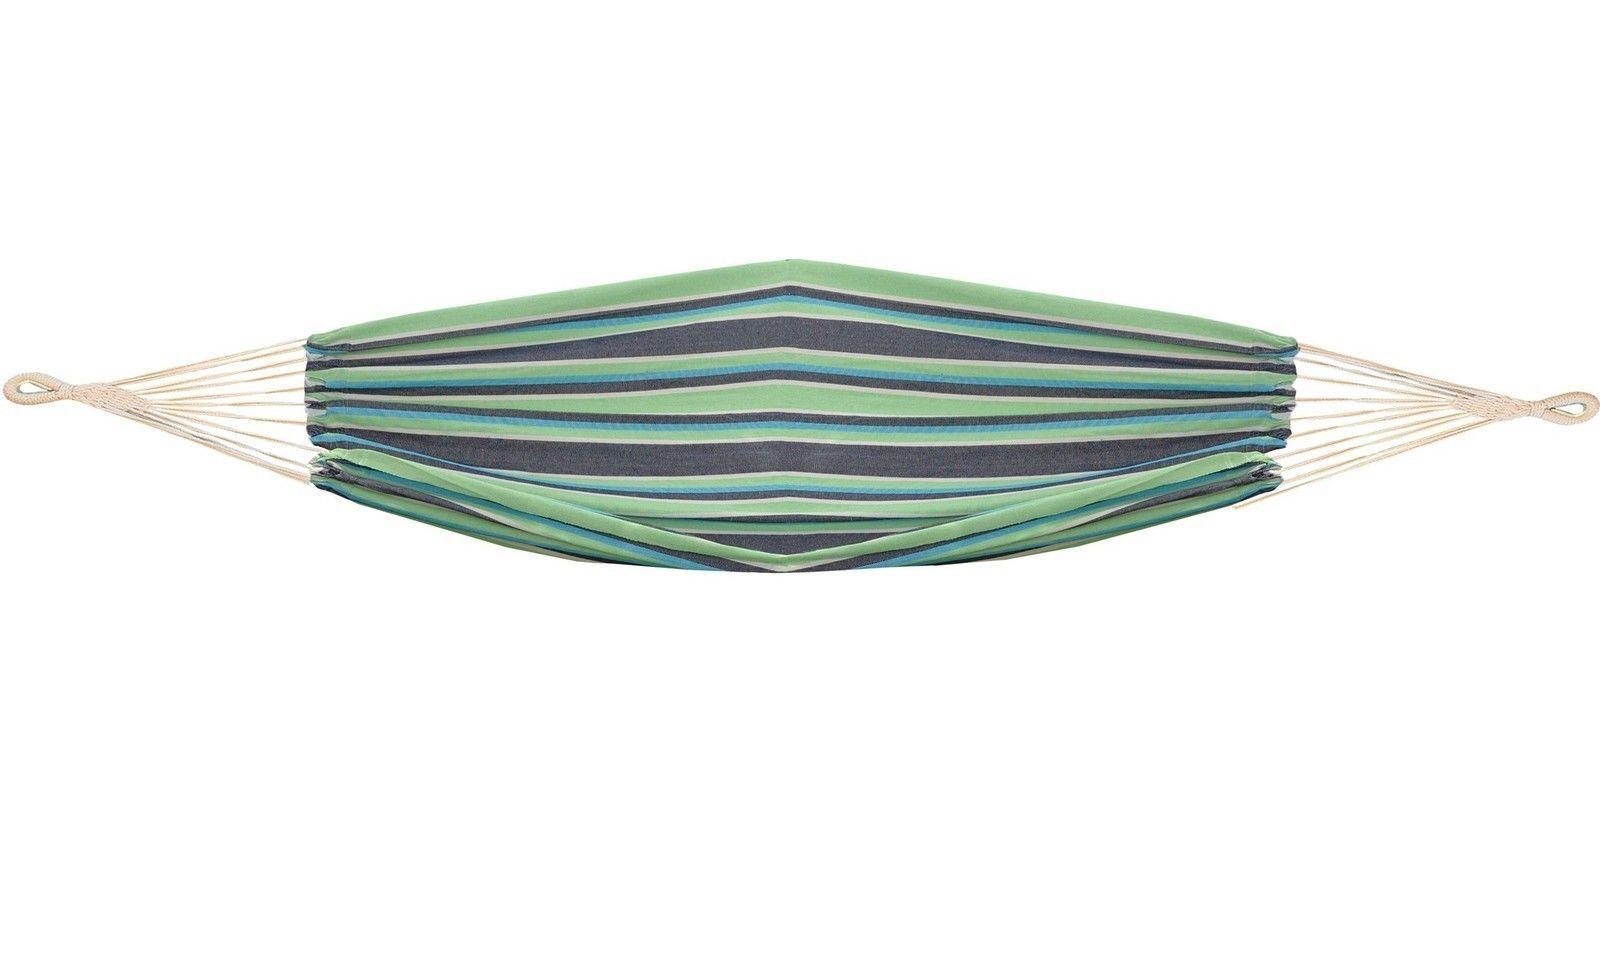 NEW Bliss Brazilian Oversized/Extra big Indoor/Outdoor Hammock in a Bag Durable